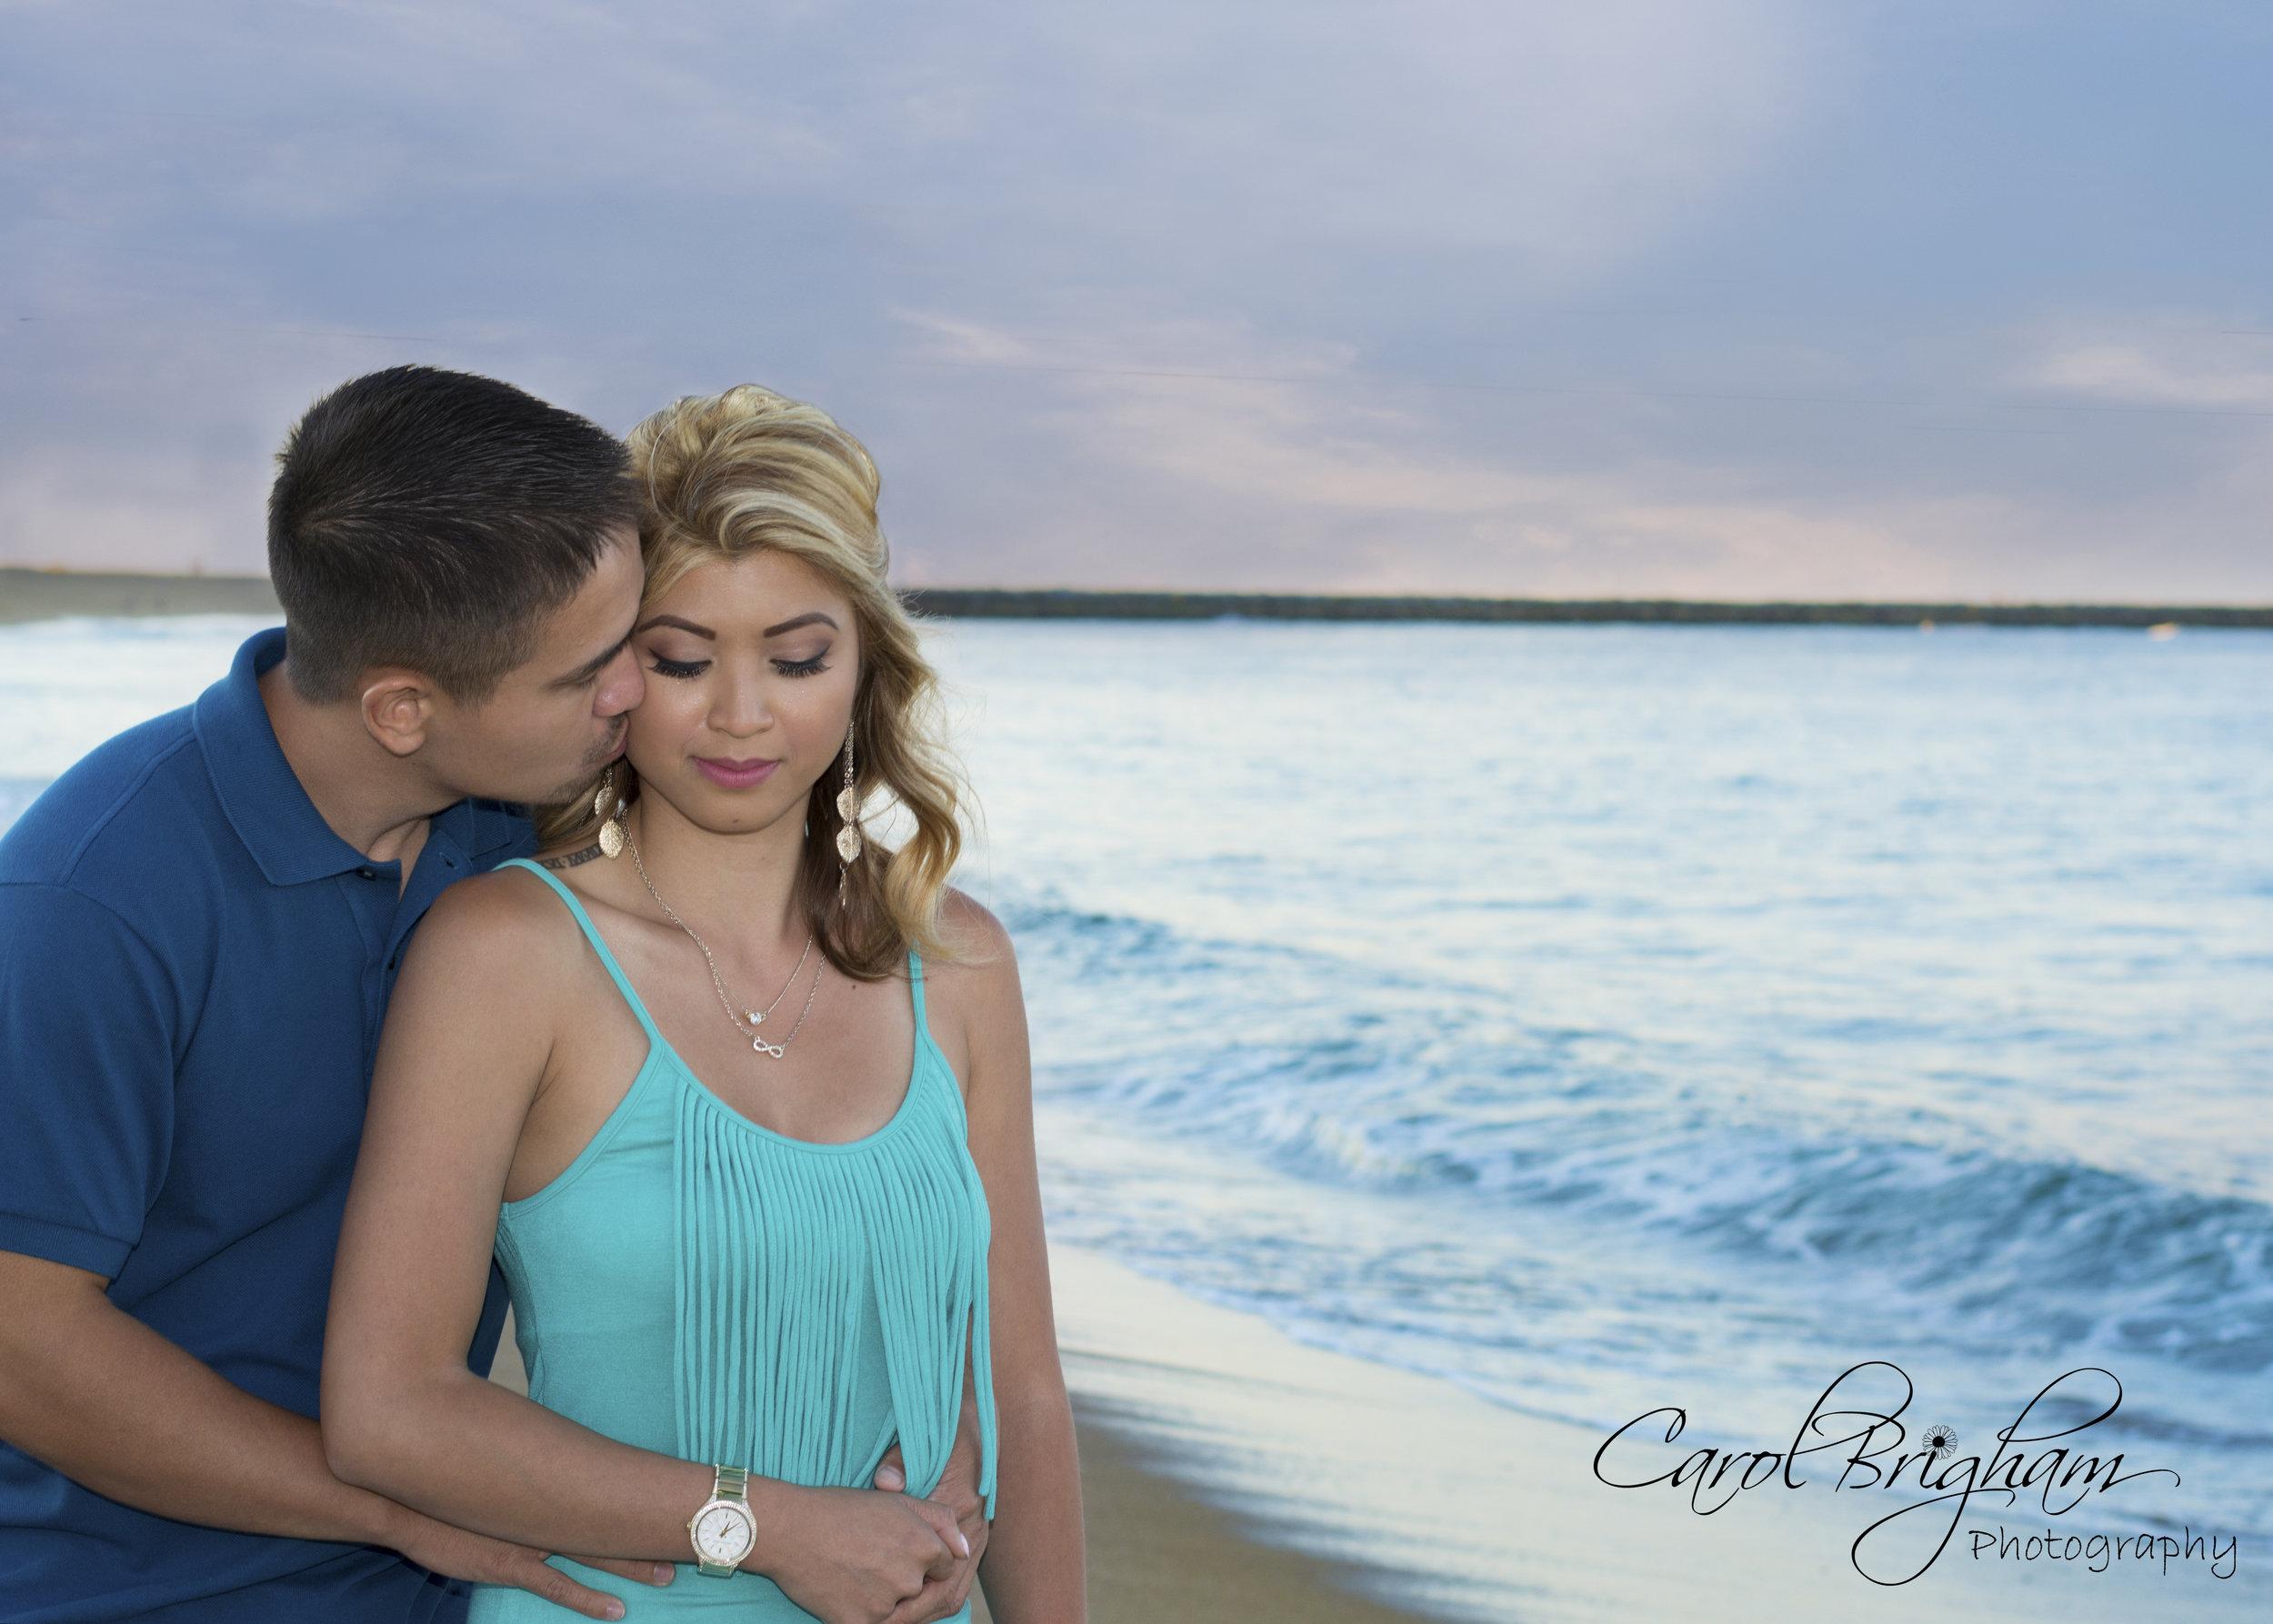 Carol-Brigham-Photography-Chi-383-3-.jpg